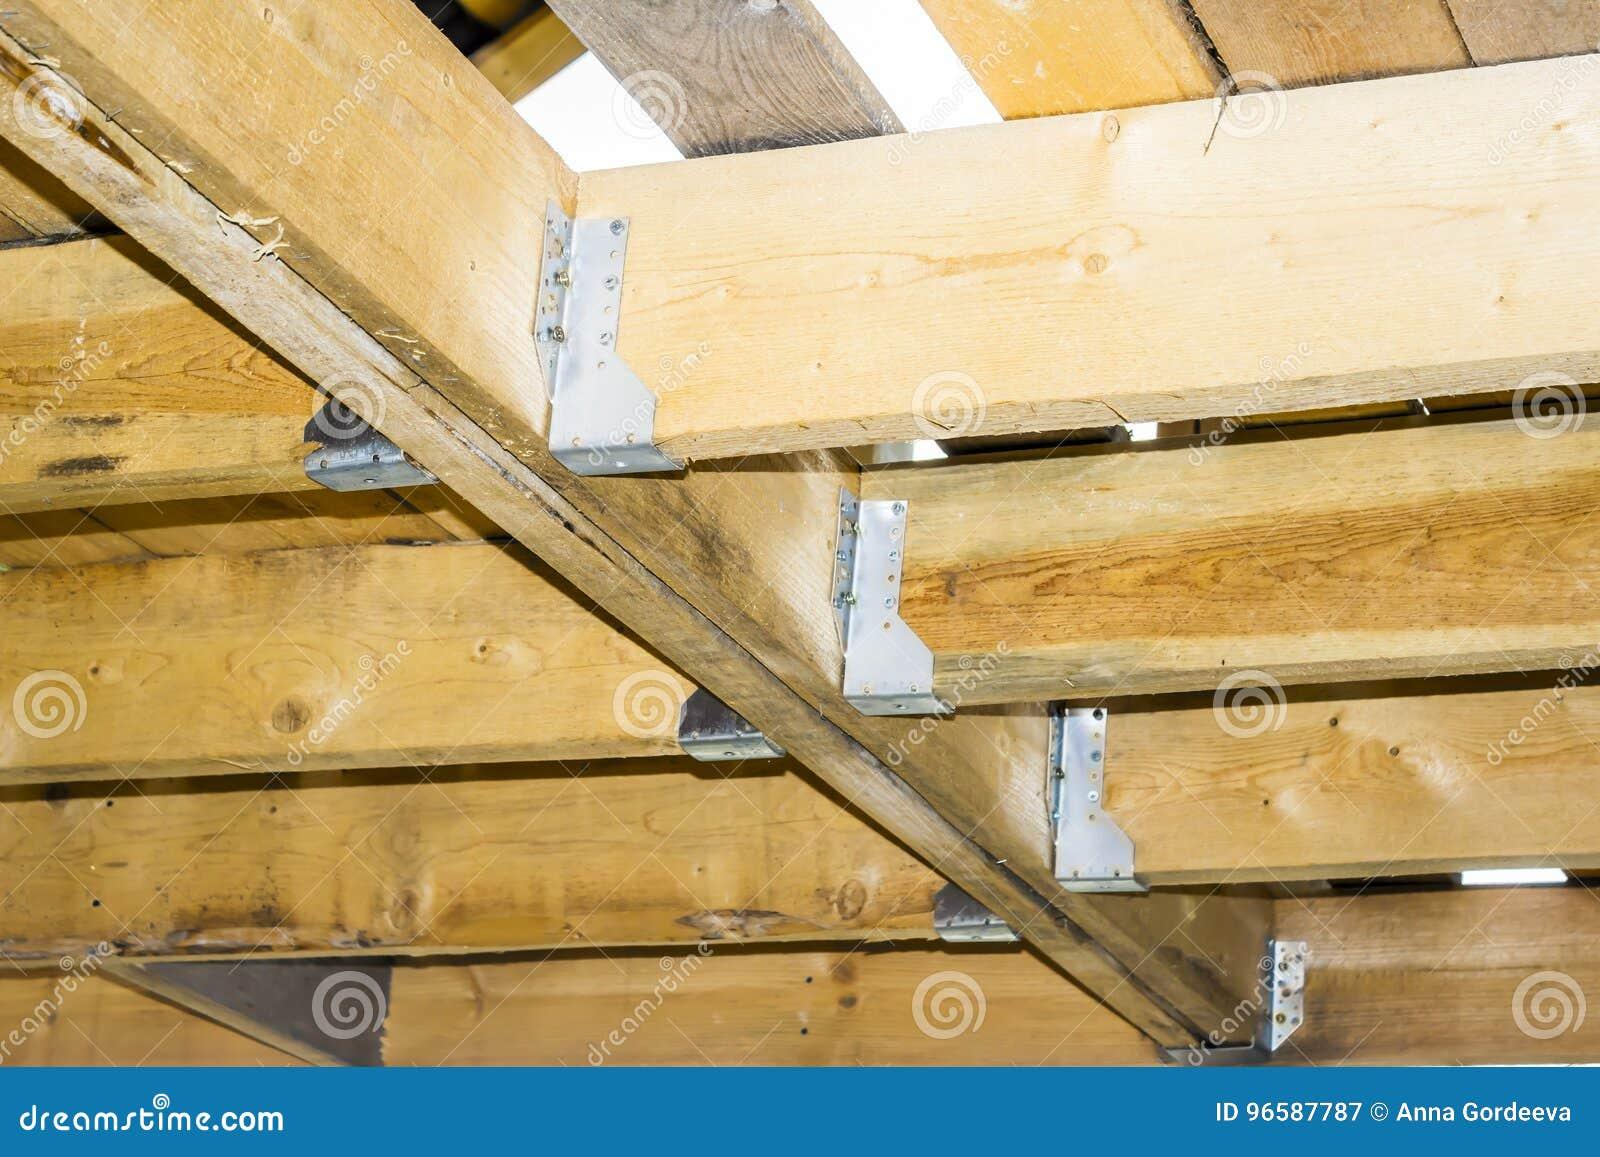 Ceiling beams - floors in a wooden frame house, metal fasteners